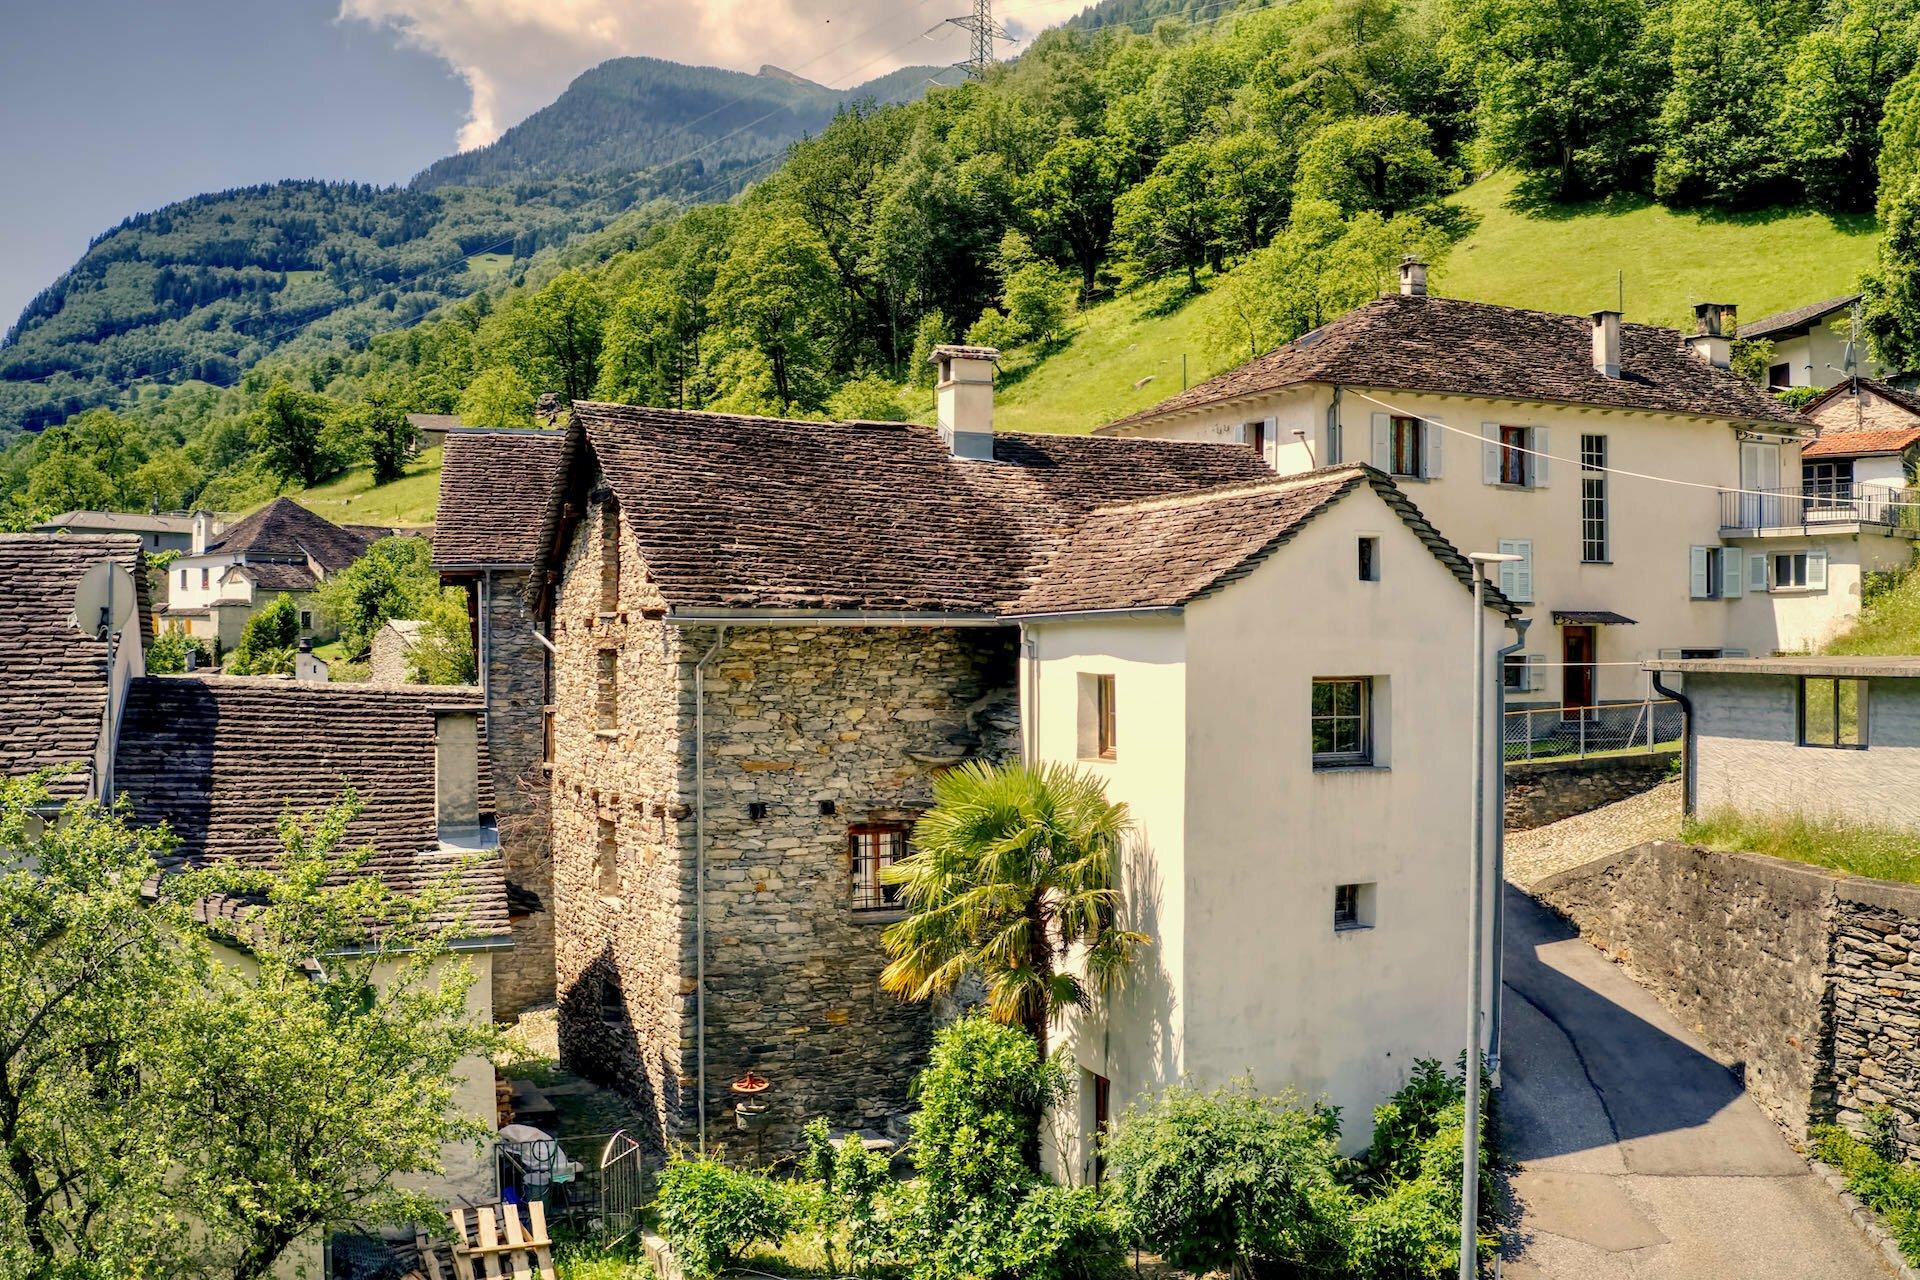 House in Soazza, Grisons, Switzerland 1